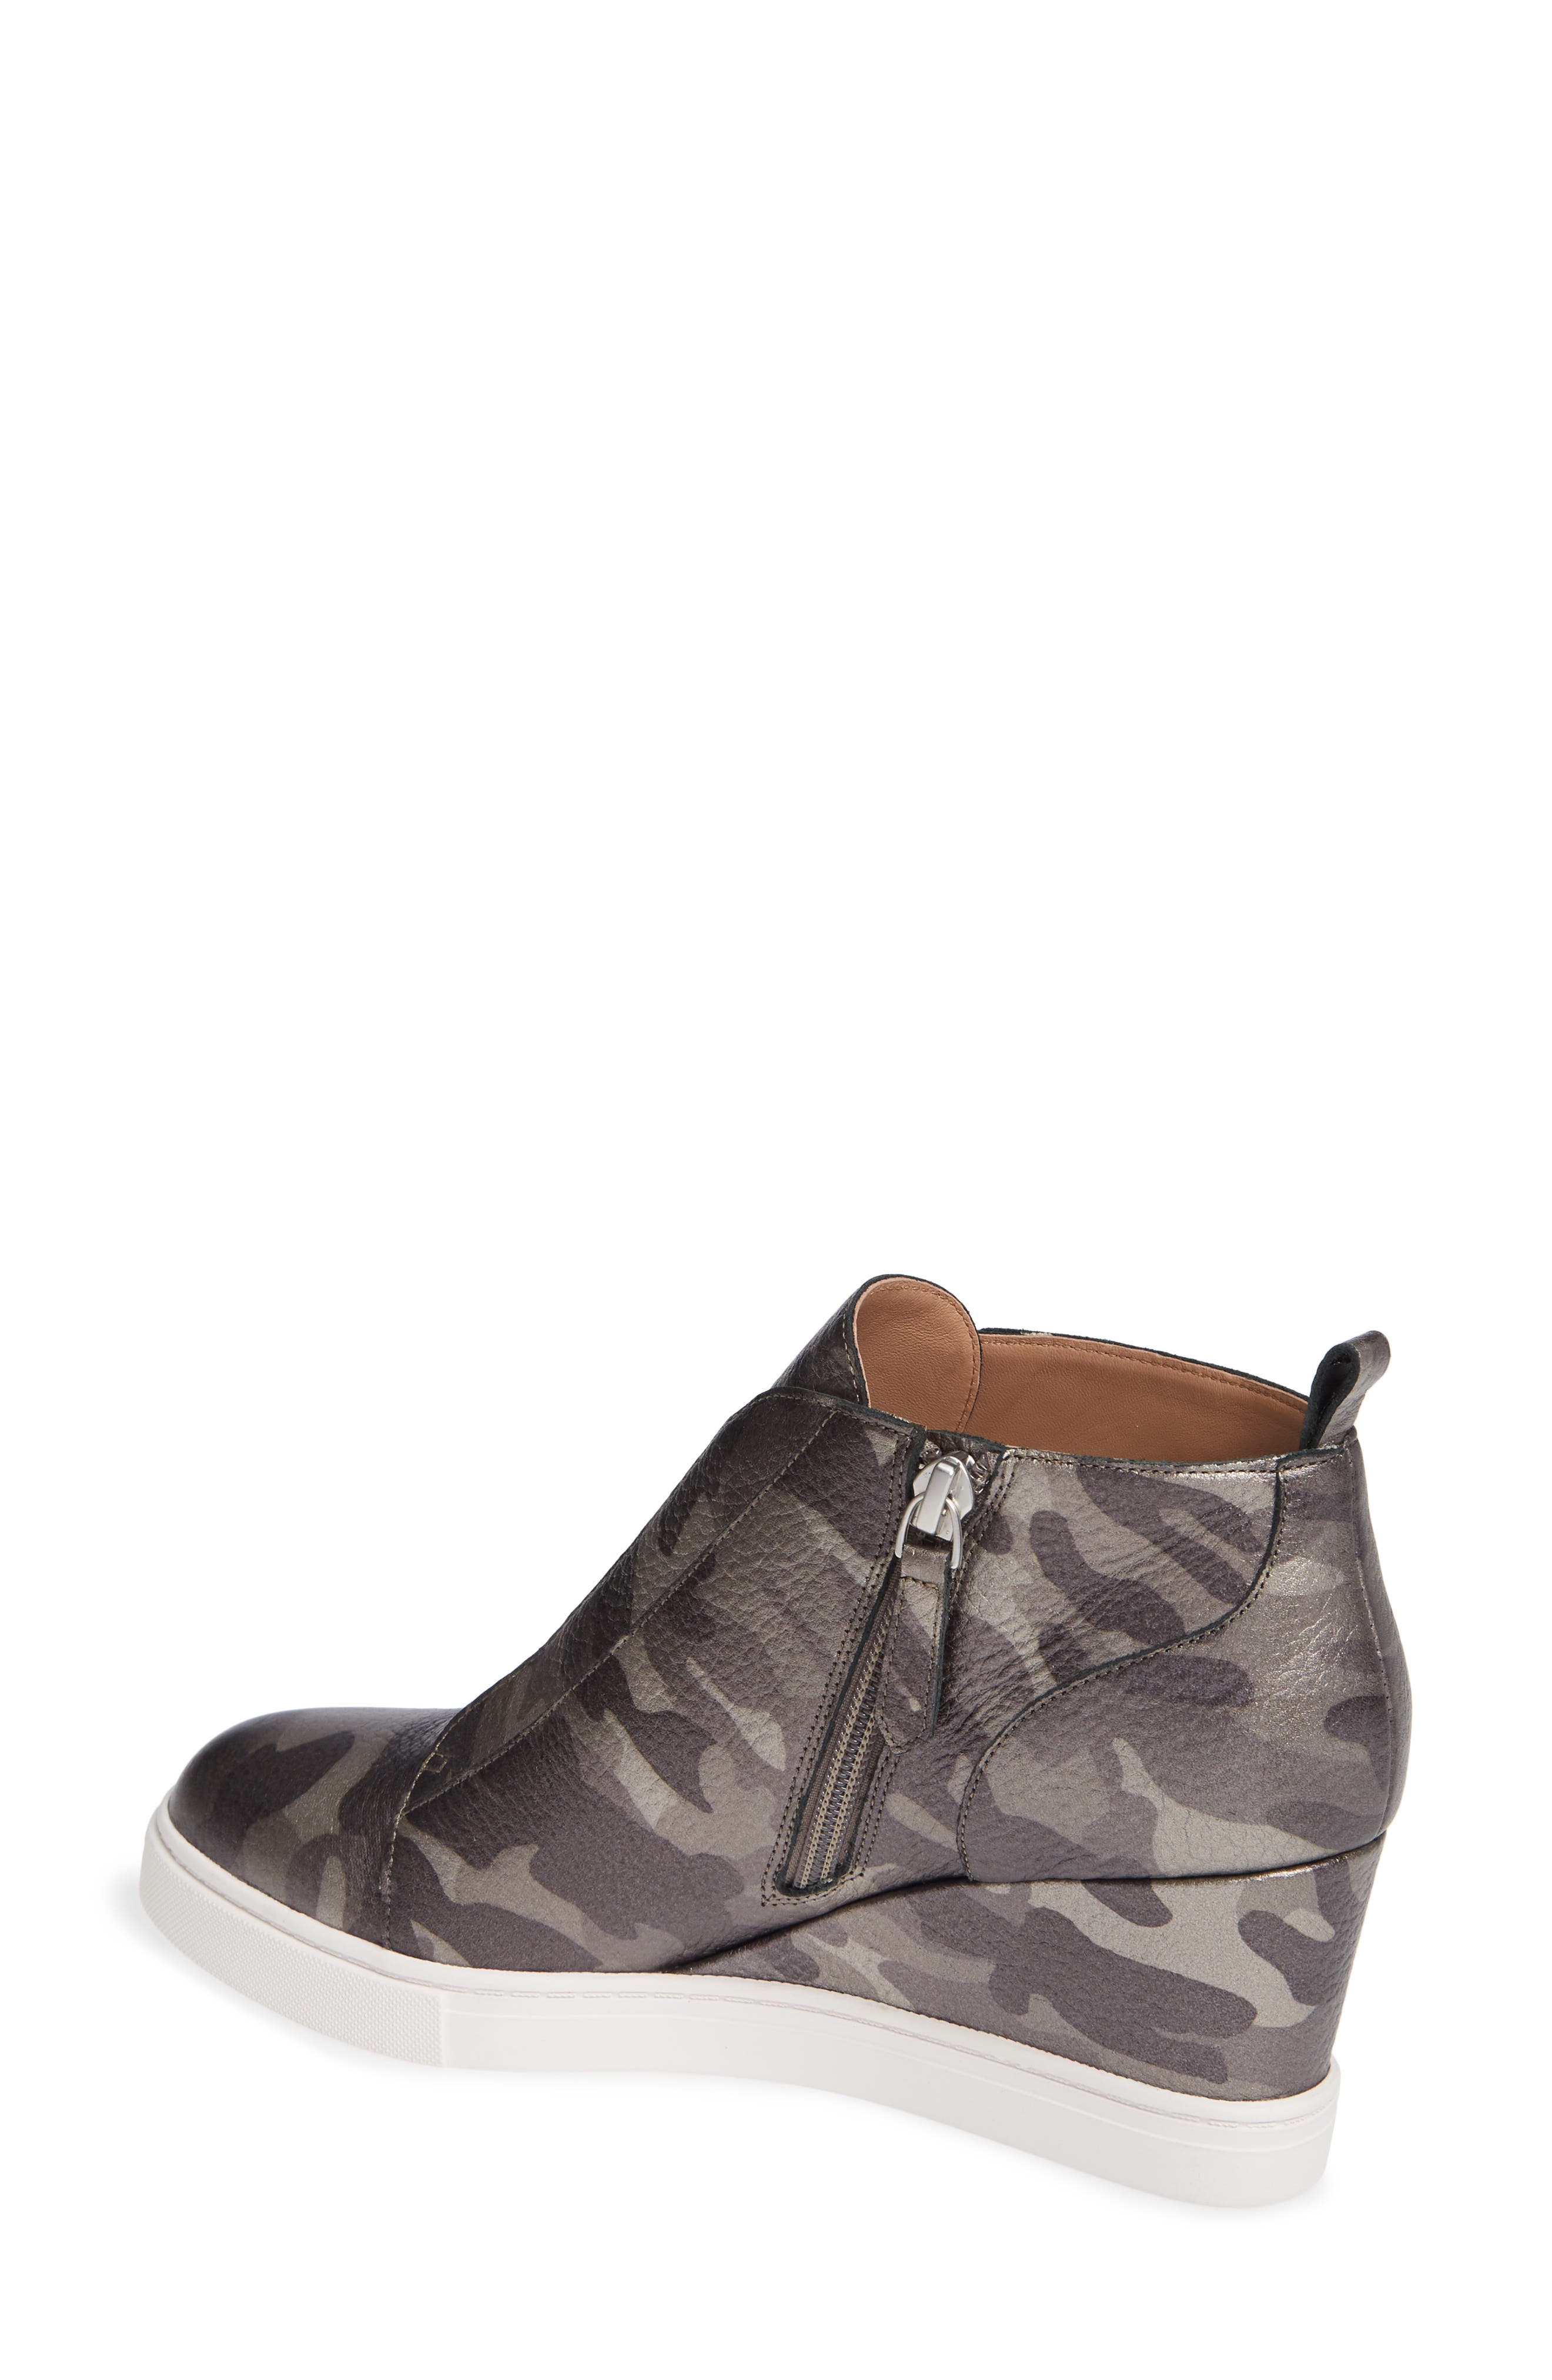 'Felicia' Wedge Bootie,                             Alternate thumbnail 2, color,                             Dark Grey Print Leather